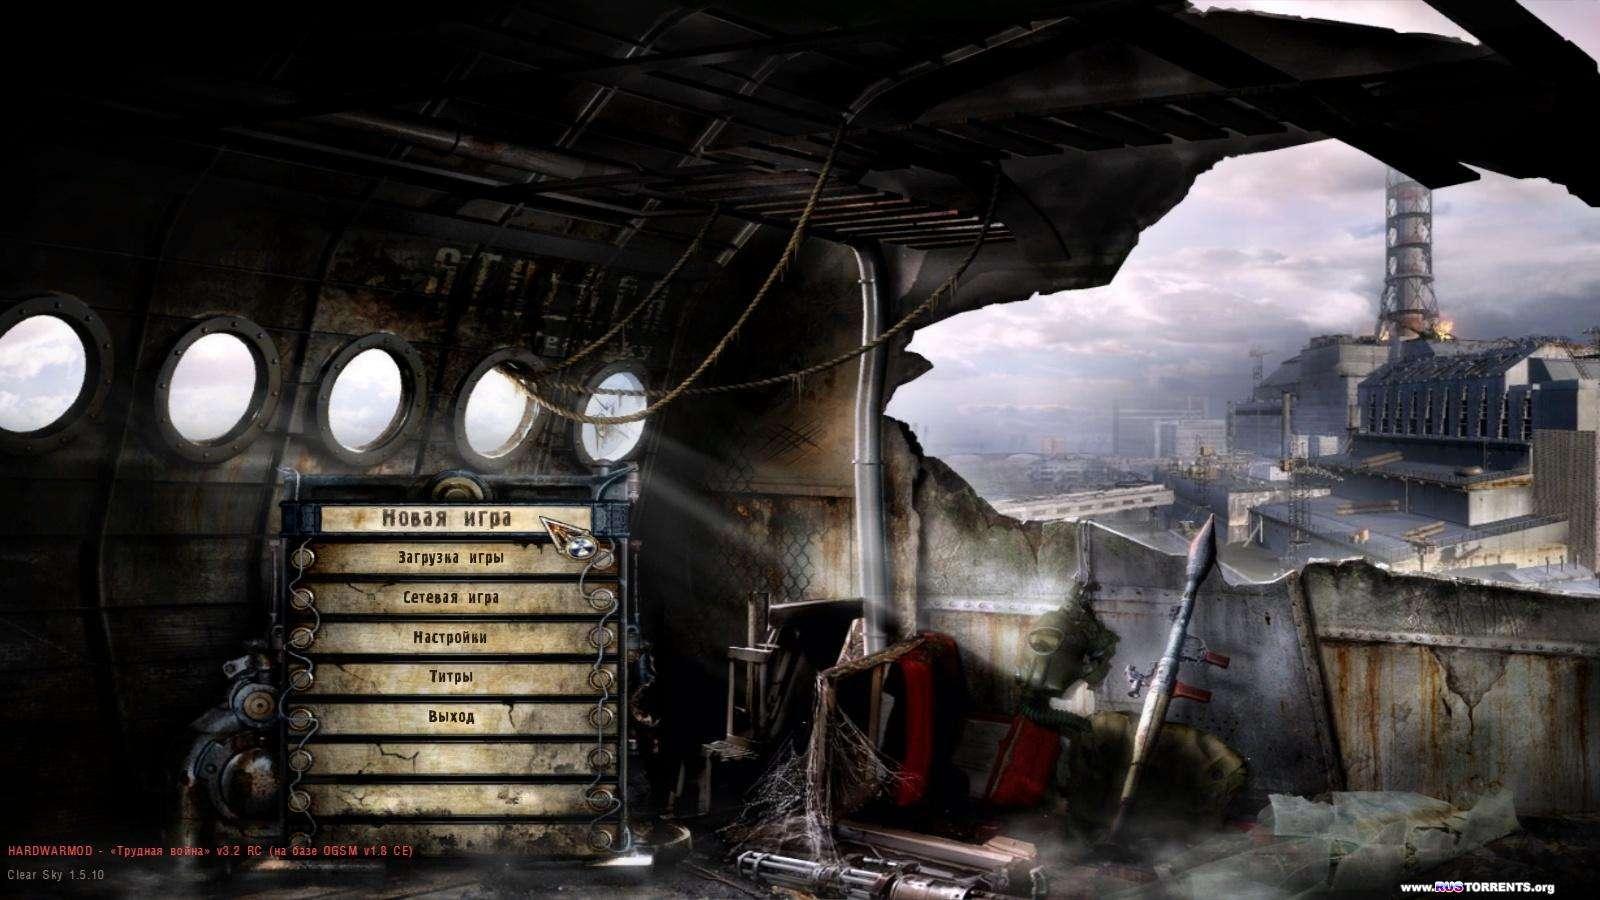 S.T.A.L.K.E.R.: Чистое Небо - HARDWARMOD